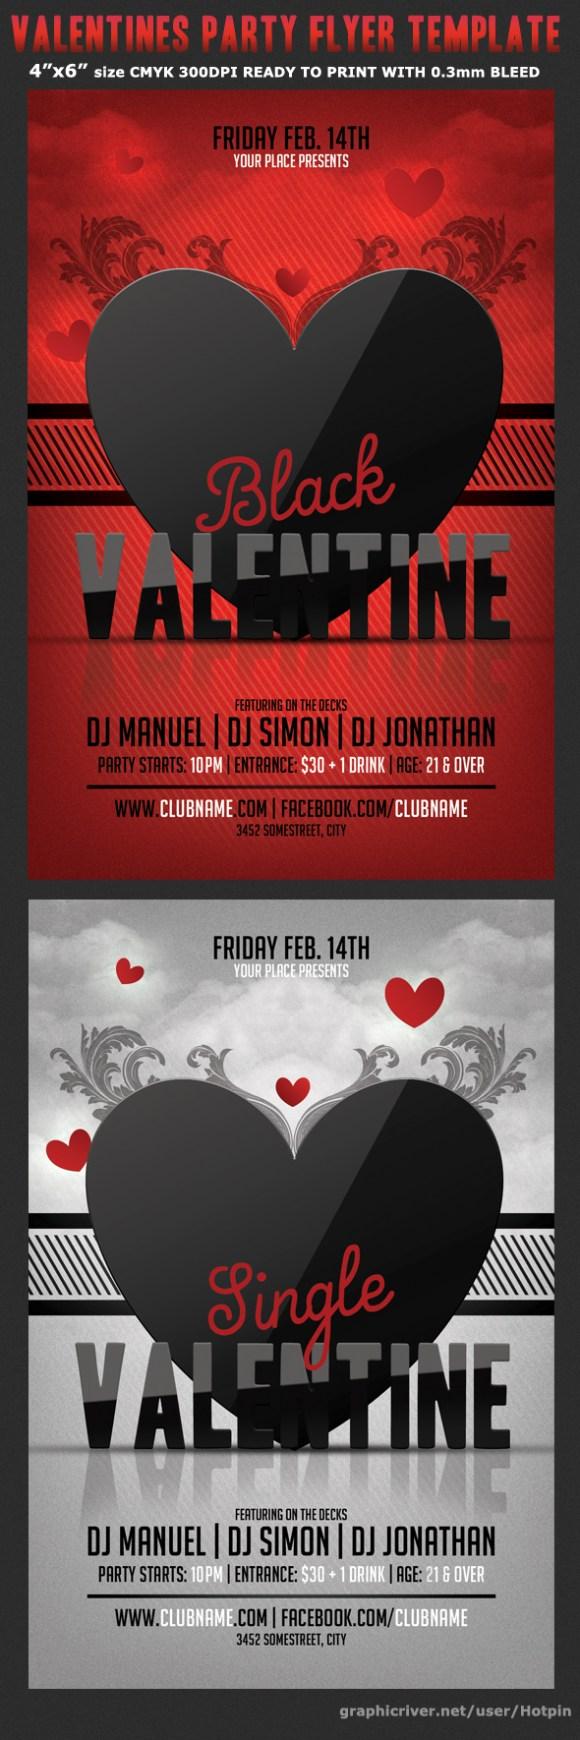 Black Valentine Party Flyer Template Flyerstemplates